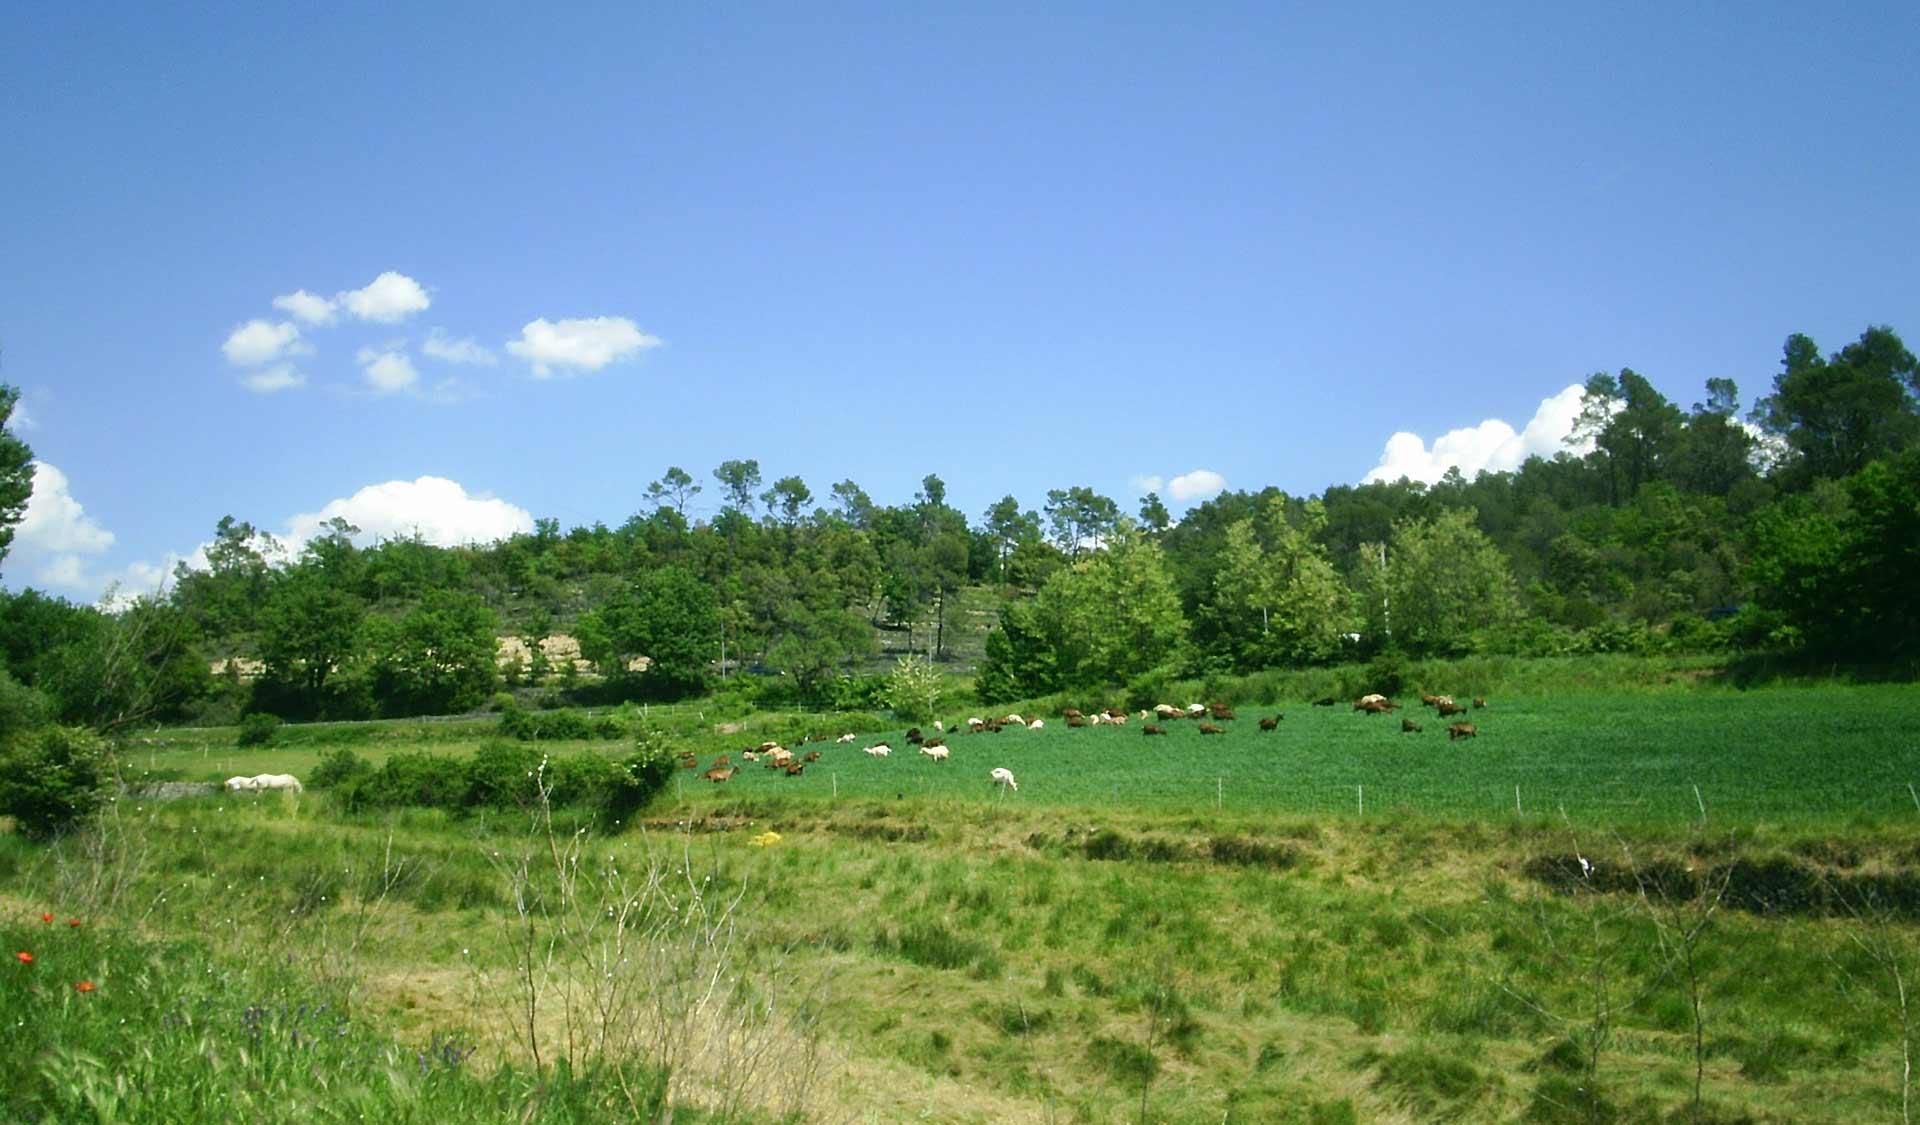 fromagerie-saint-jaume-troupeau